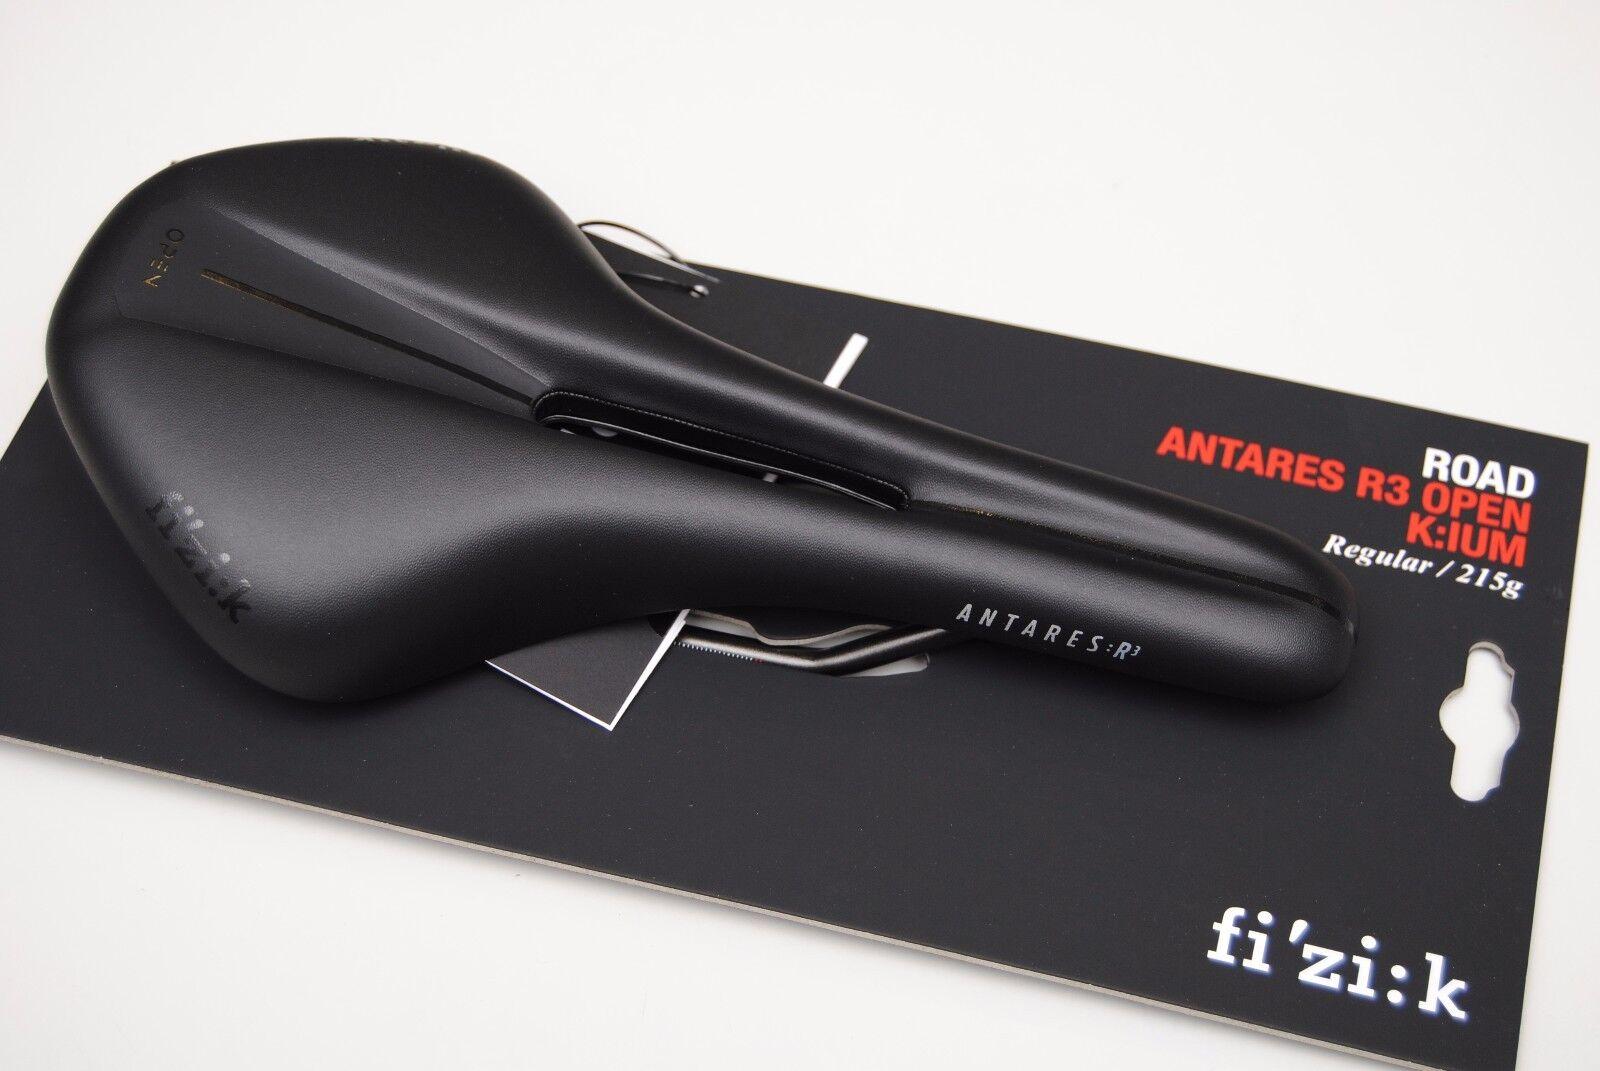 Sella Fizik ANTARES R3 OPEN Regular 140mm Kium negro SADDLE FIZIK ANTARES R3